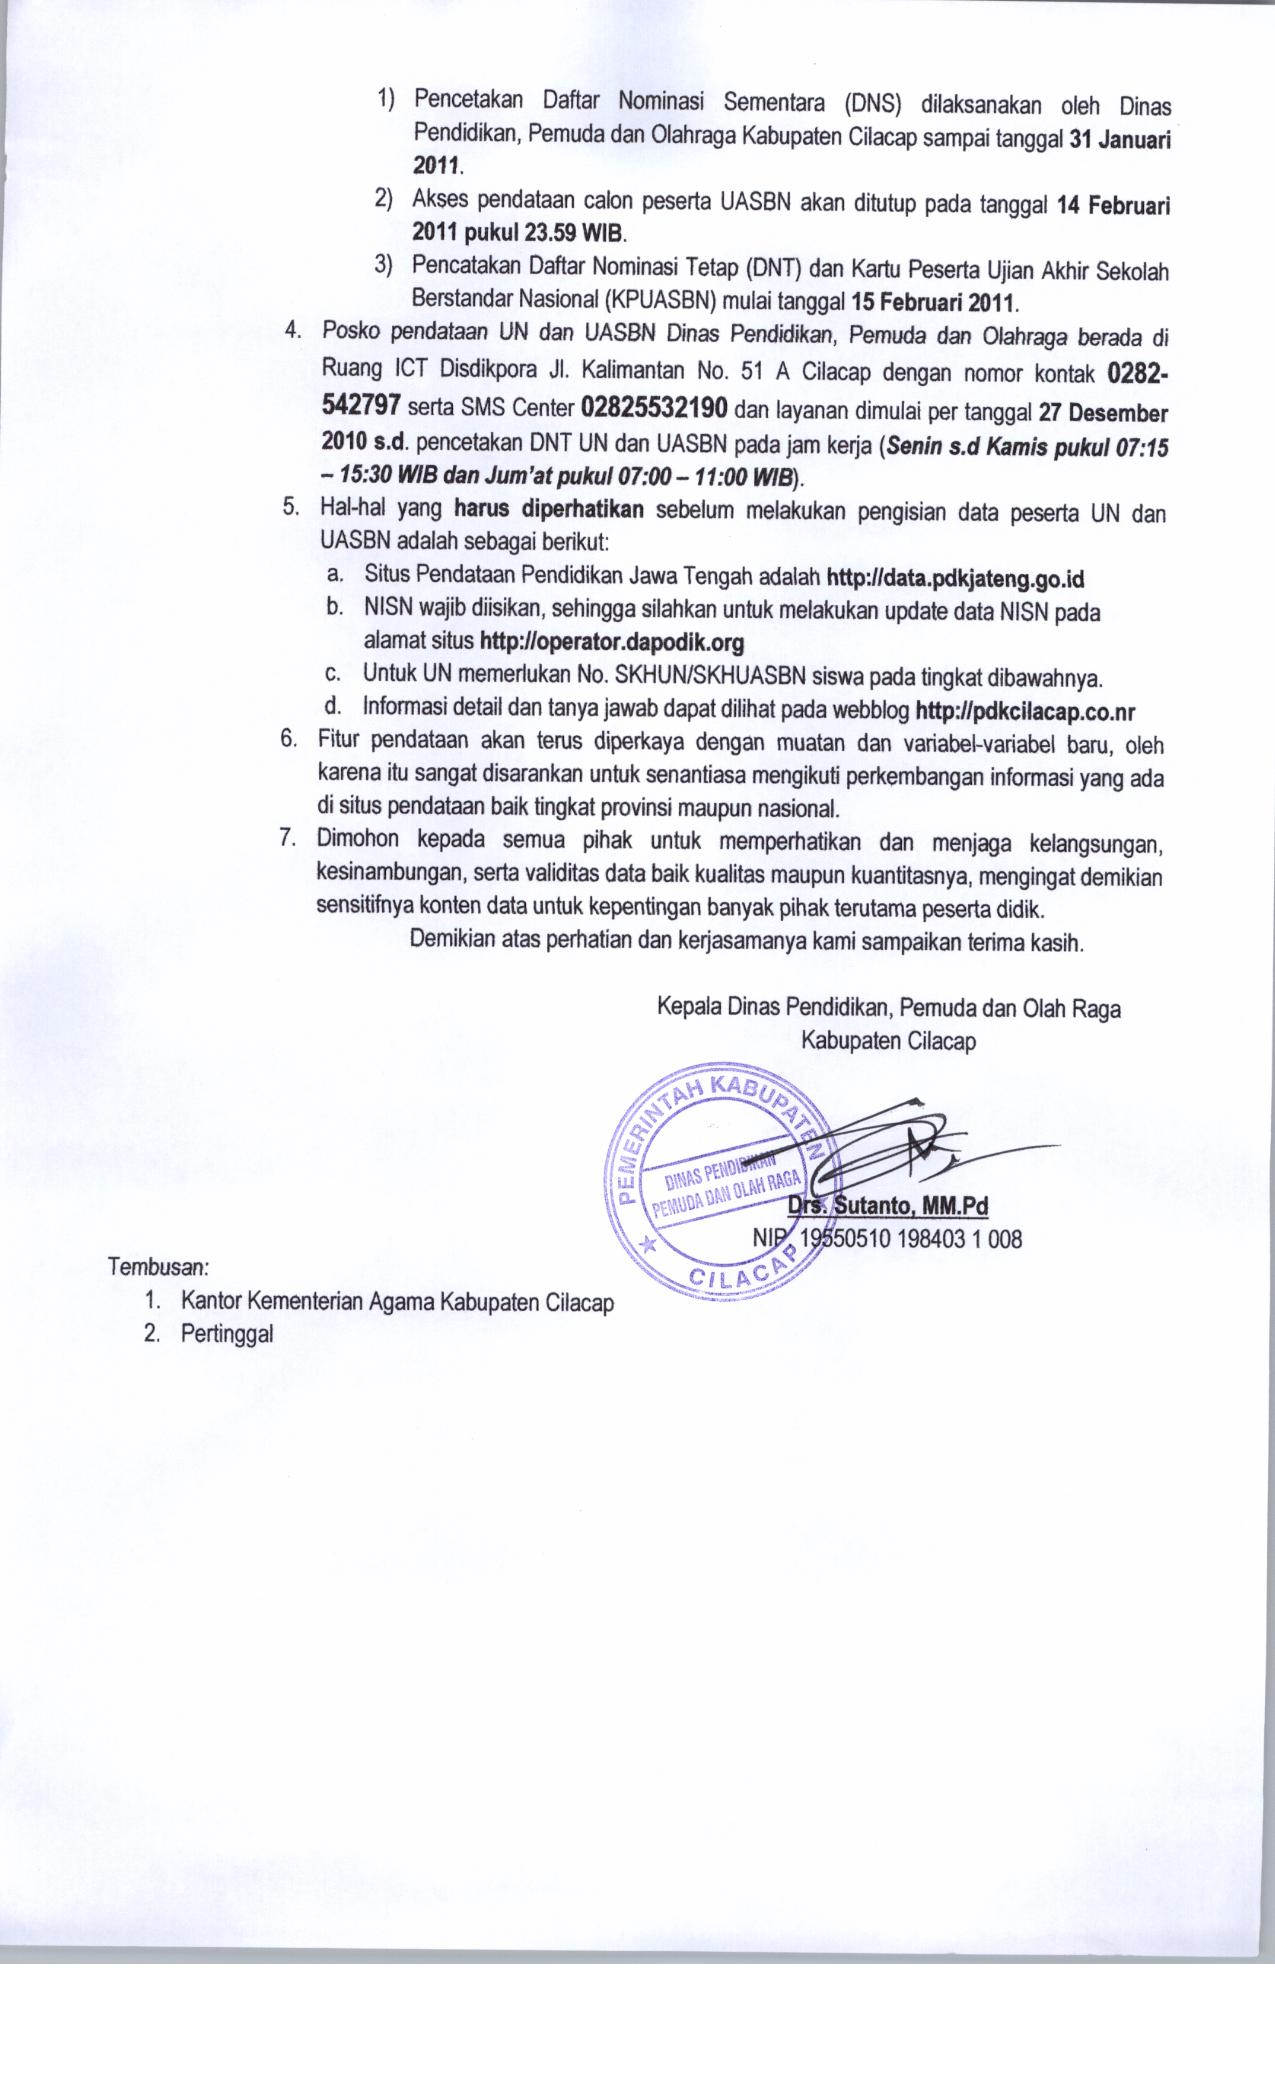 Surat Un Uasbn2 Dinas Pendidikan Dan Kebudayaan Kabupaten